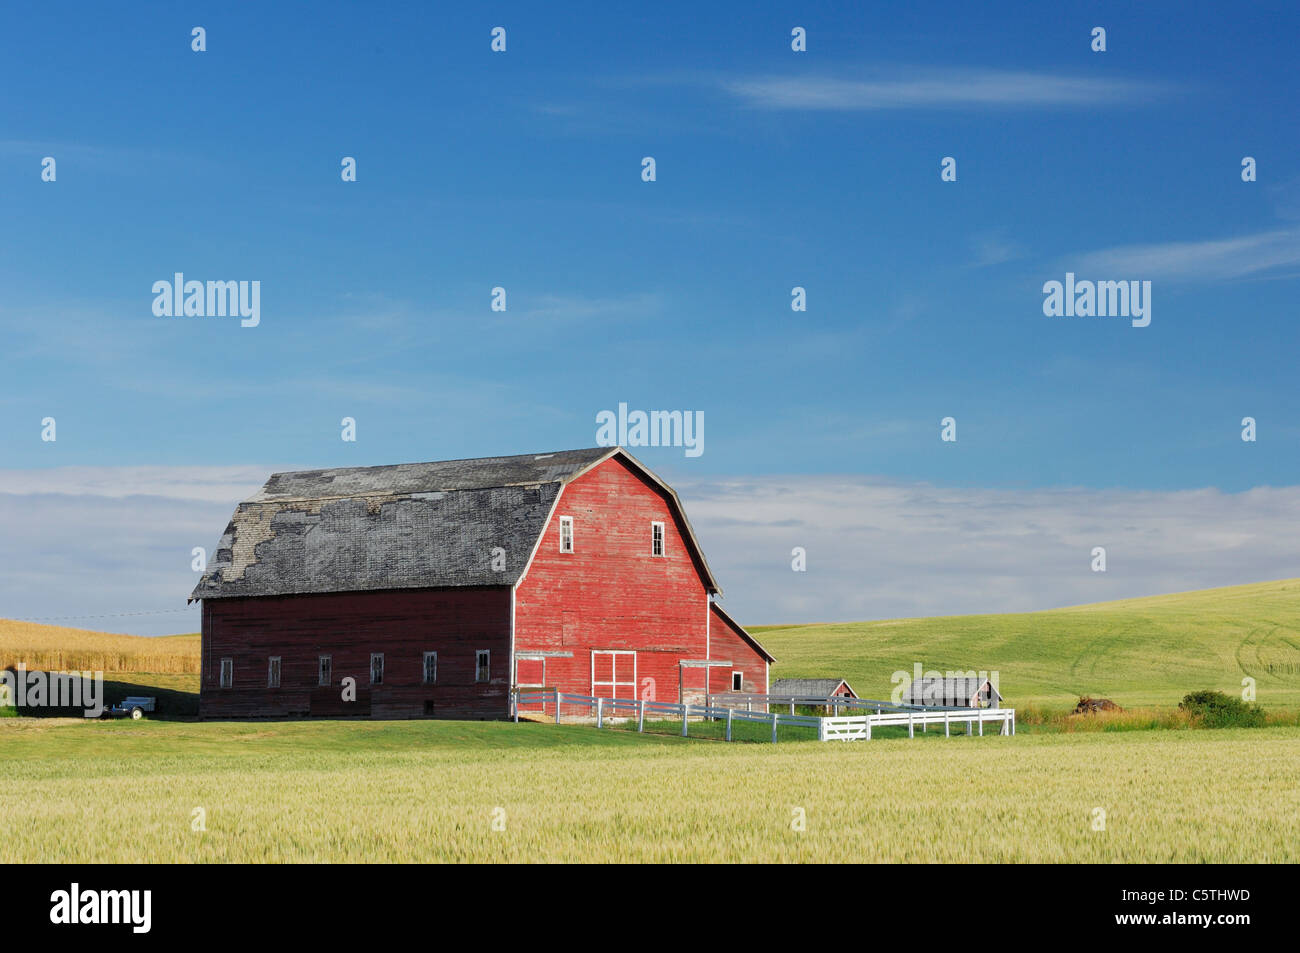 USA, Palouse, Whitman County, Washington State, Barn in field - Stock Image